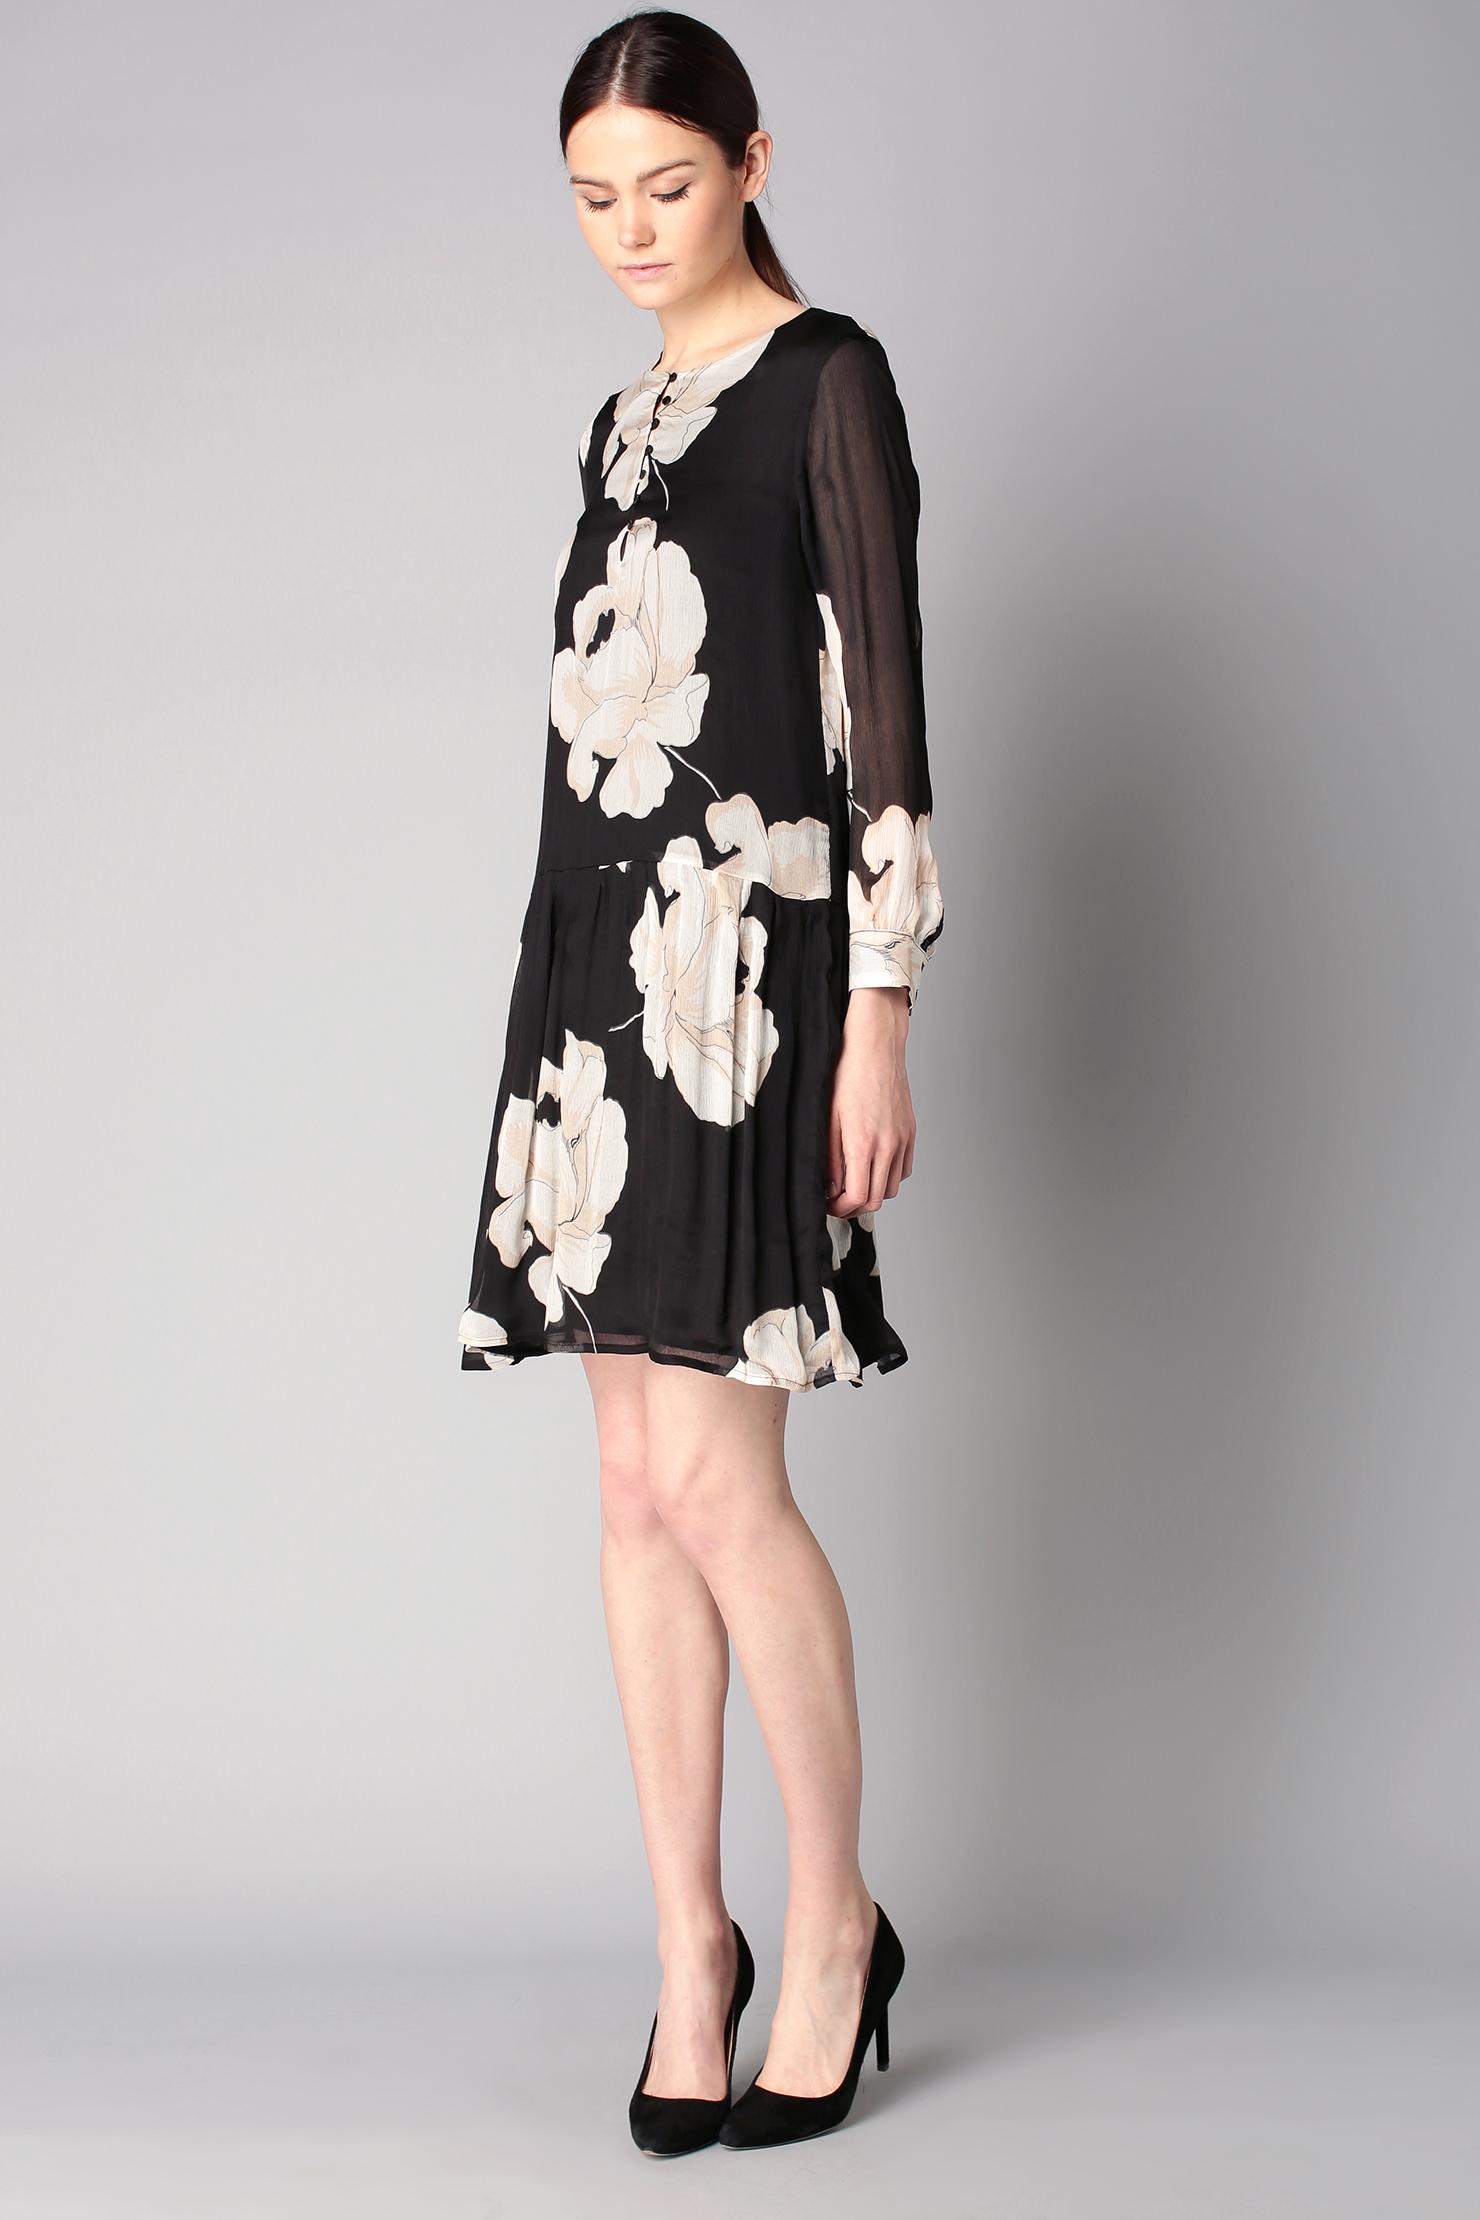 Gerard darel evening dresses